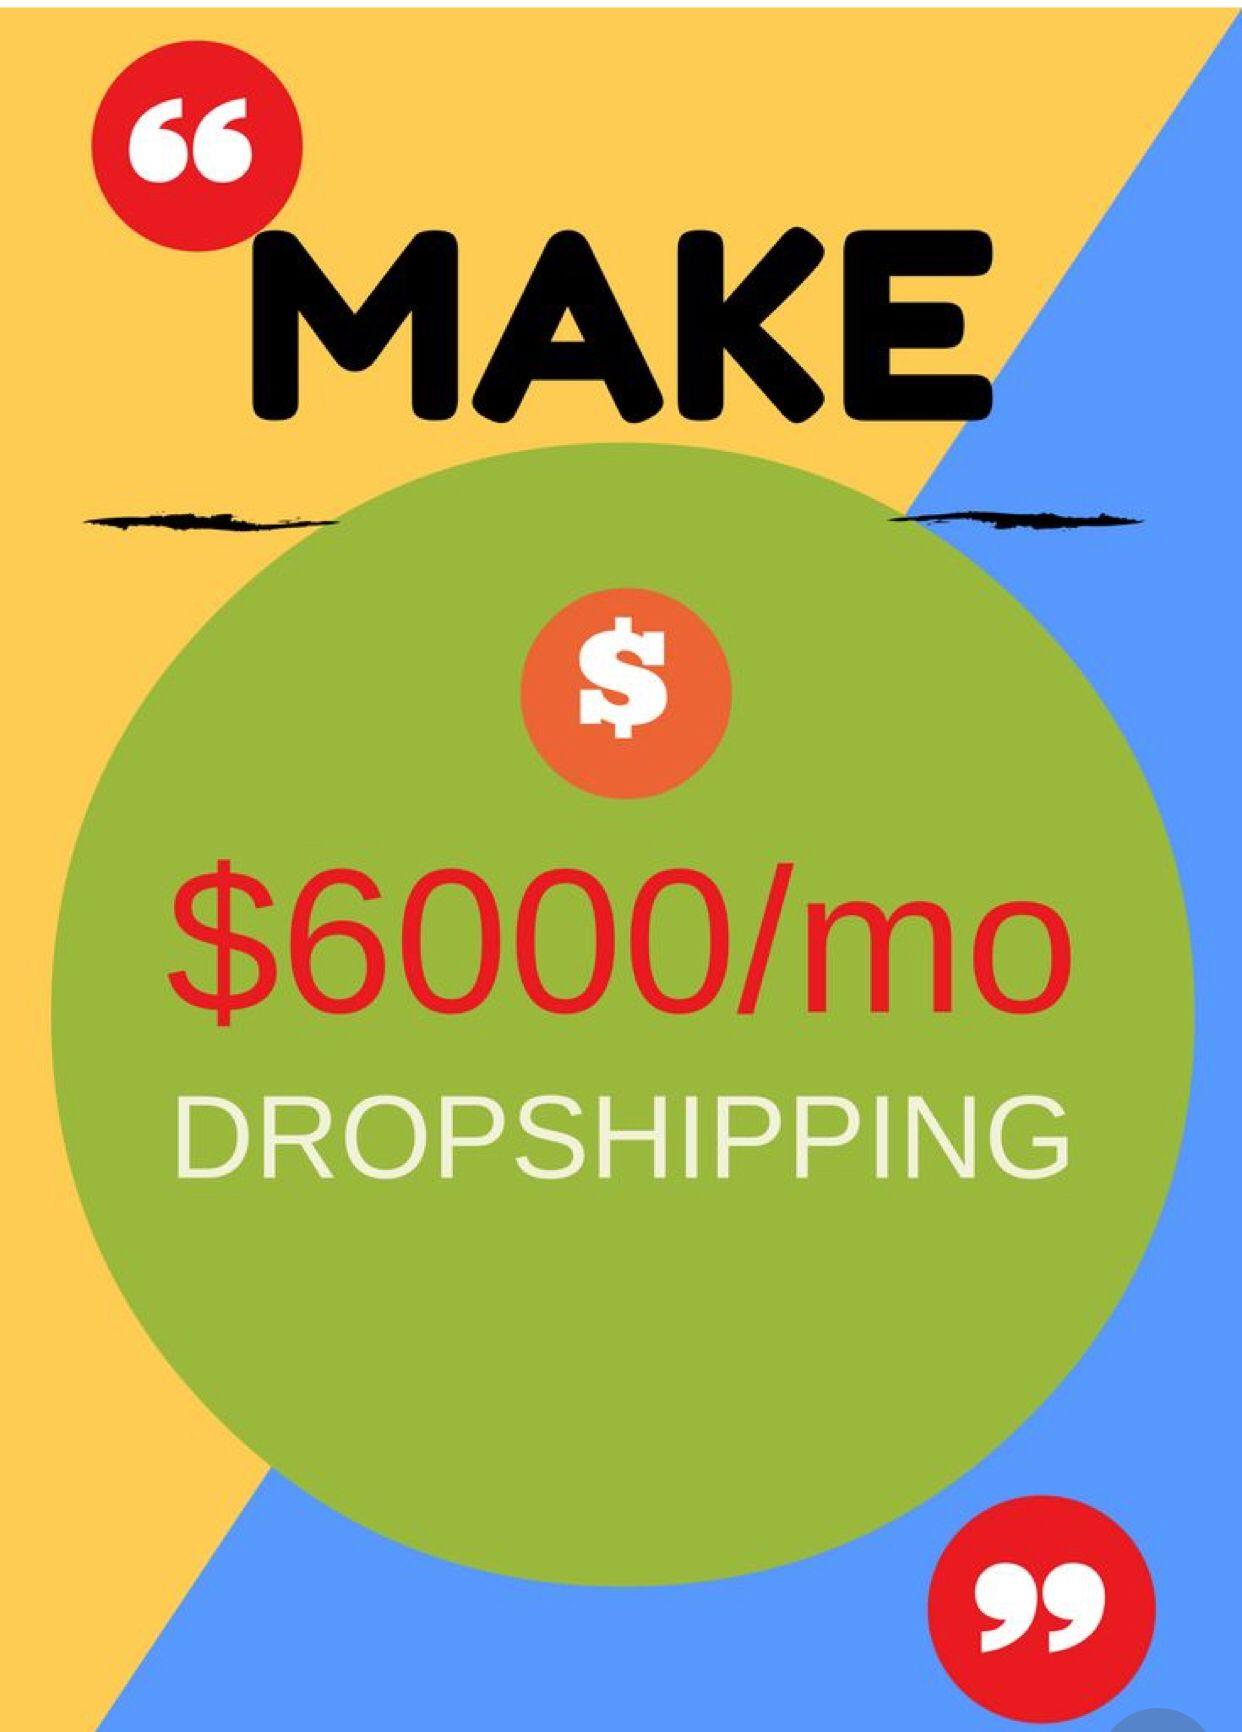 dropshipping money Dropshipping